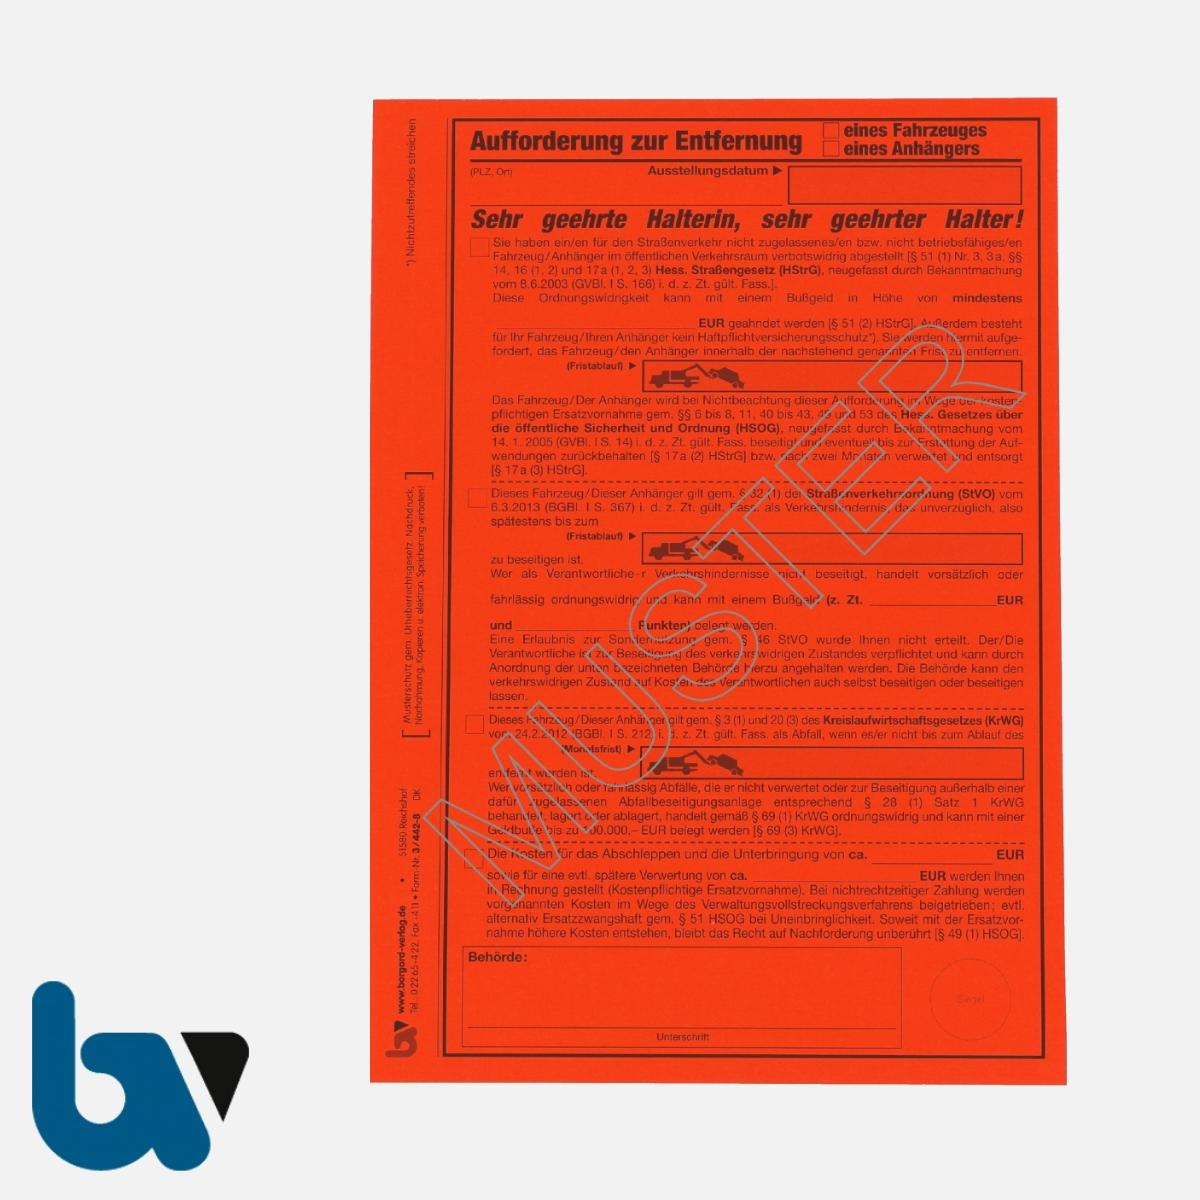 3/442-8 Aufkleber Aufforderung Entfernung Fahrzeug Anhänger selbstklebend Hessen-HStrG HSOG StVO KrWG Aufnahmeprotokoll Abfall DIN A5 VS | Borgard Verlag GmbH